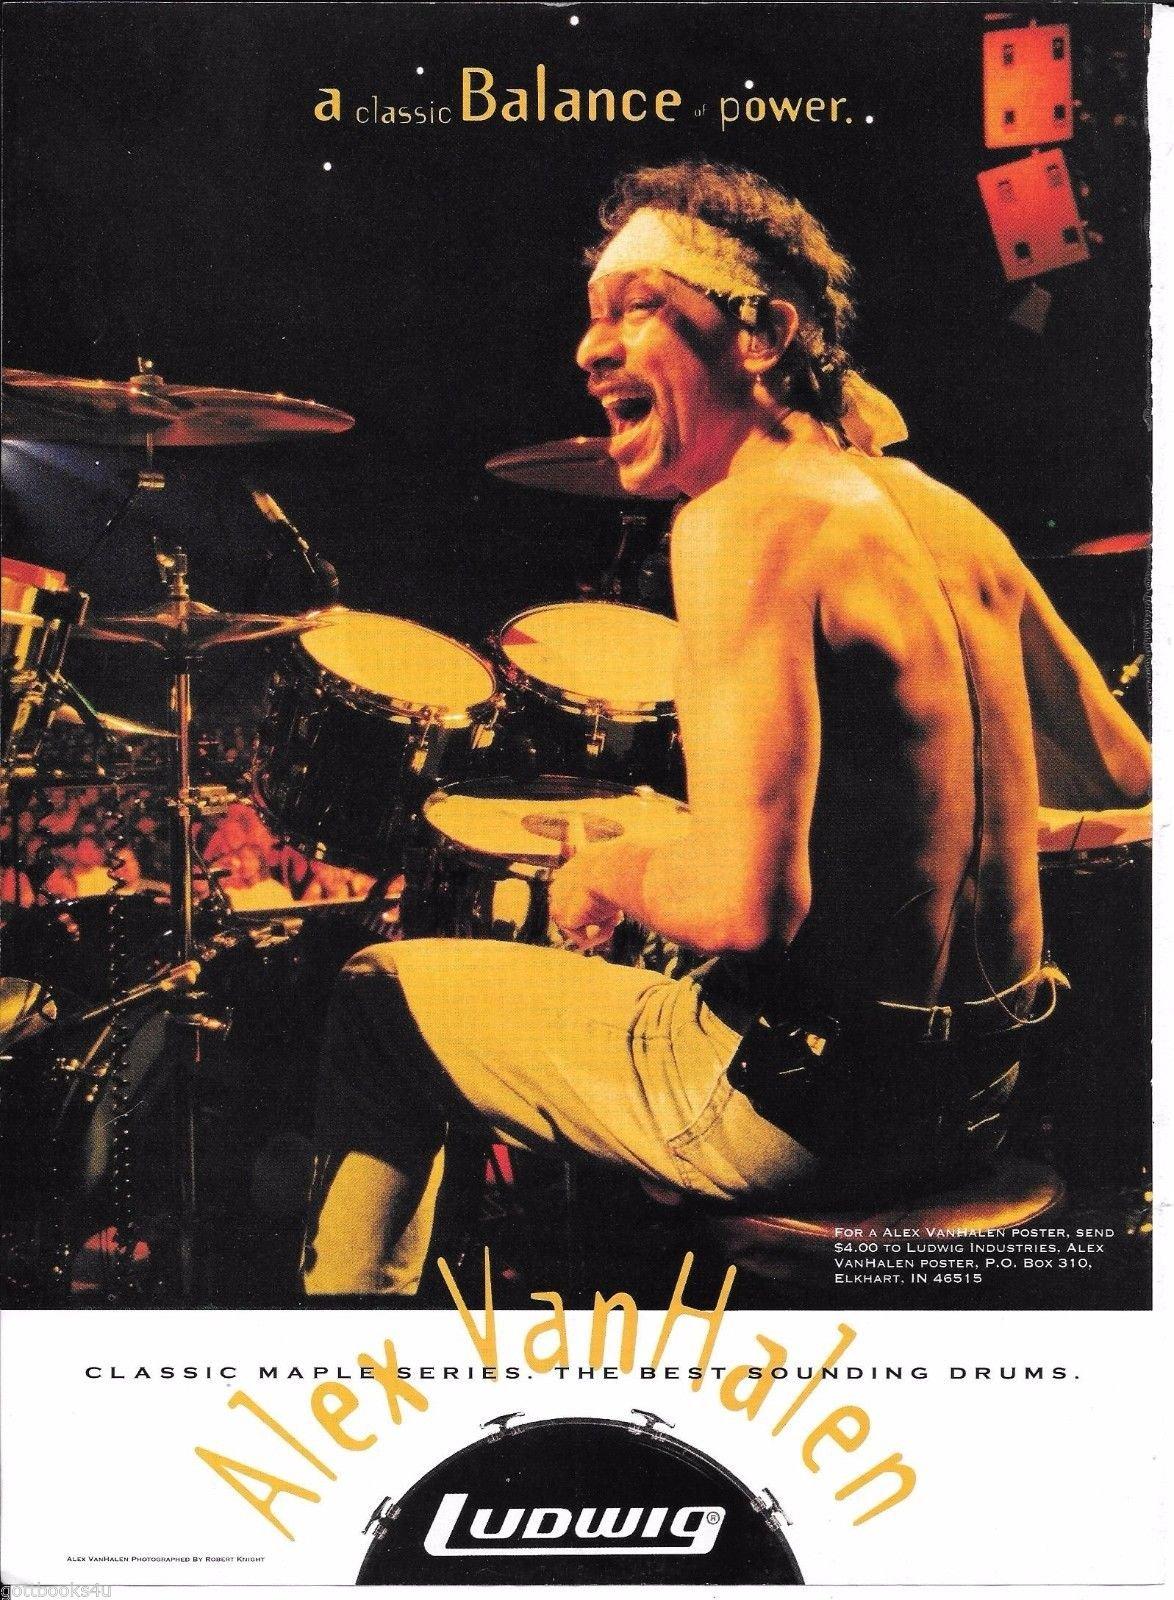 Ludwig Drums Classic Maple Series Alex Van Halen 1998 Advertisement Modern Drummer 6238301086094 Amazon Com Books